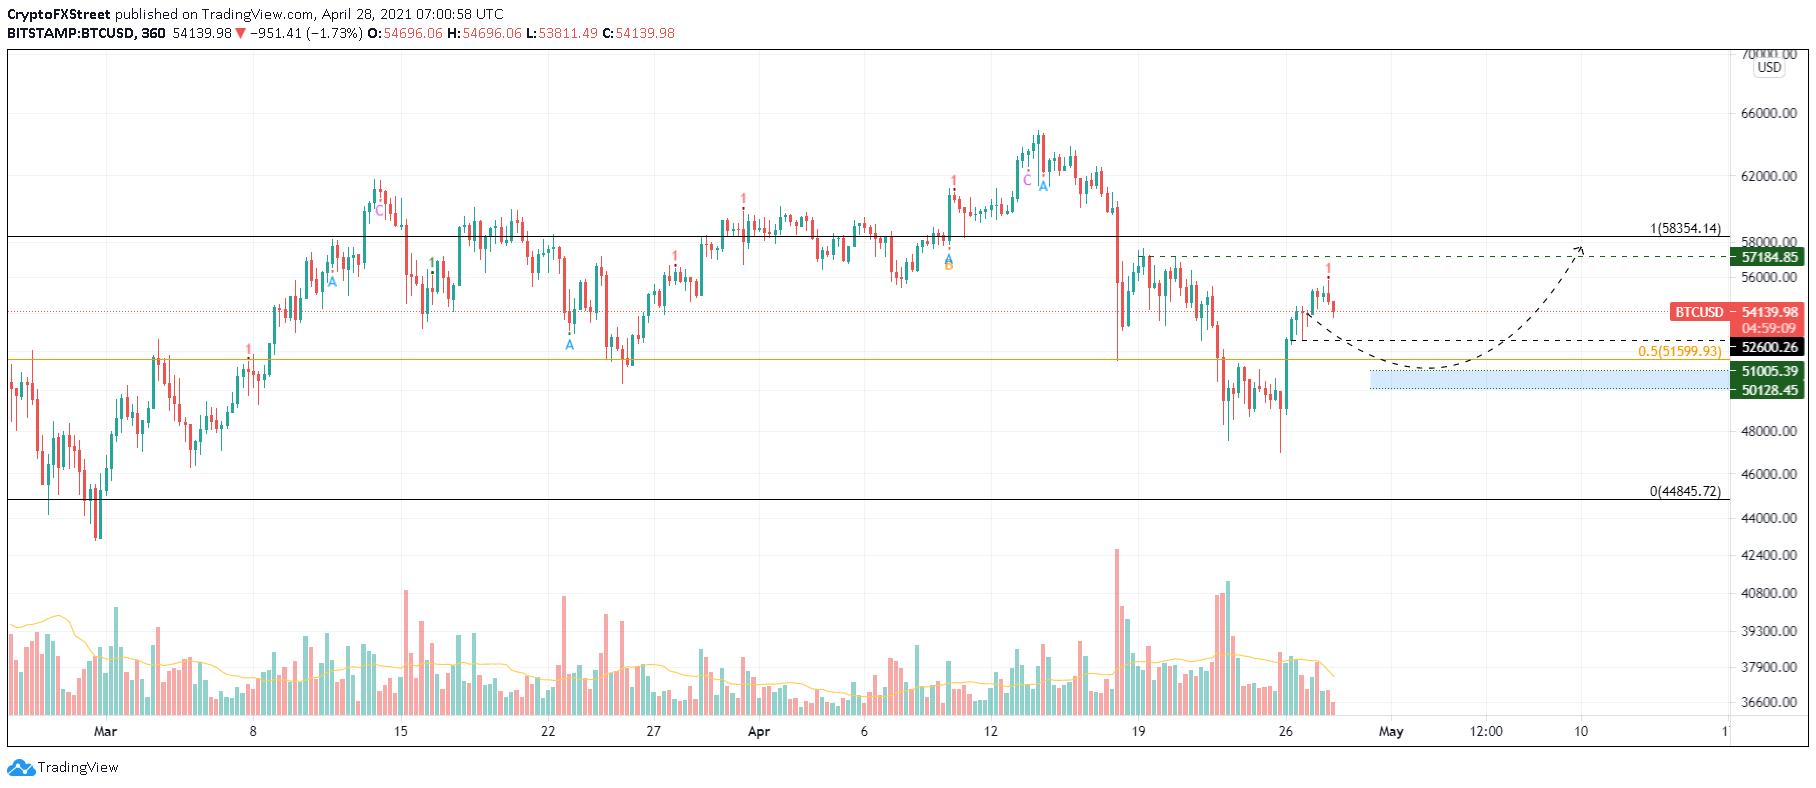 BTC/USD 6-hour chart